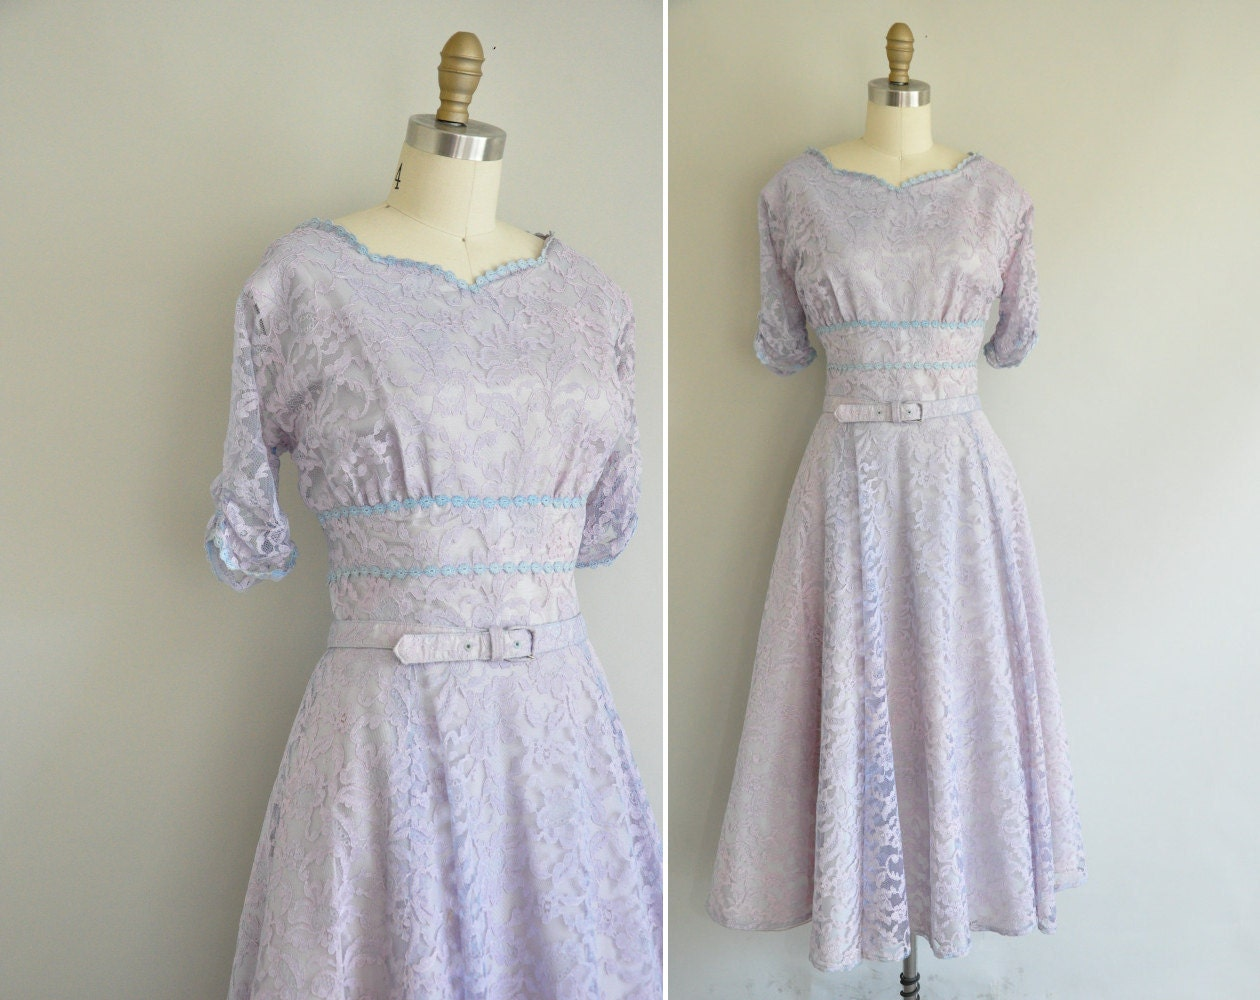 White cotton eyeley dress